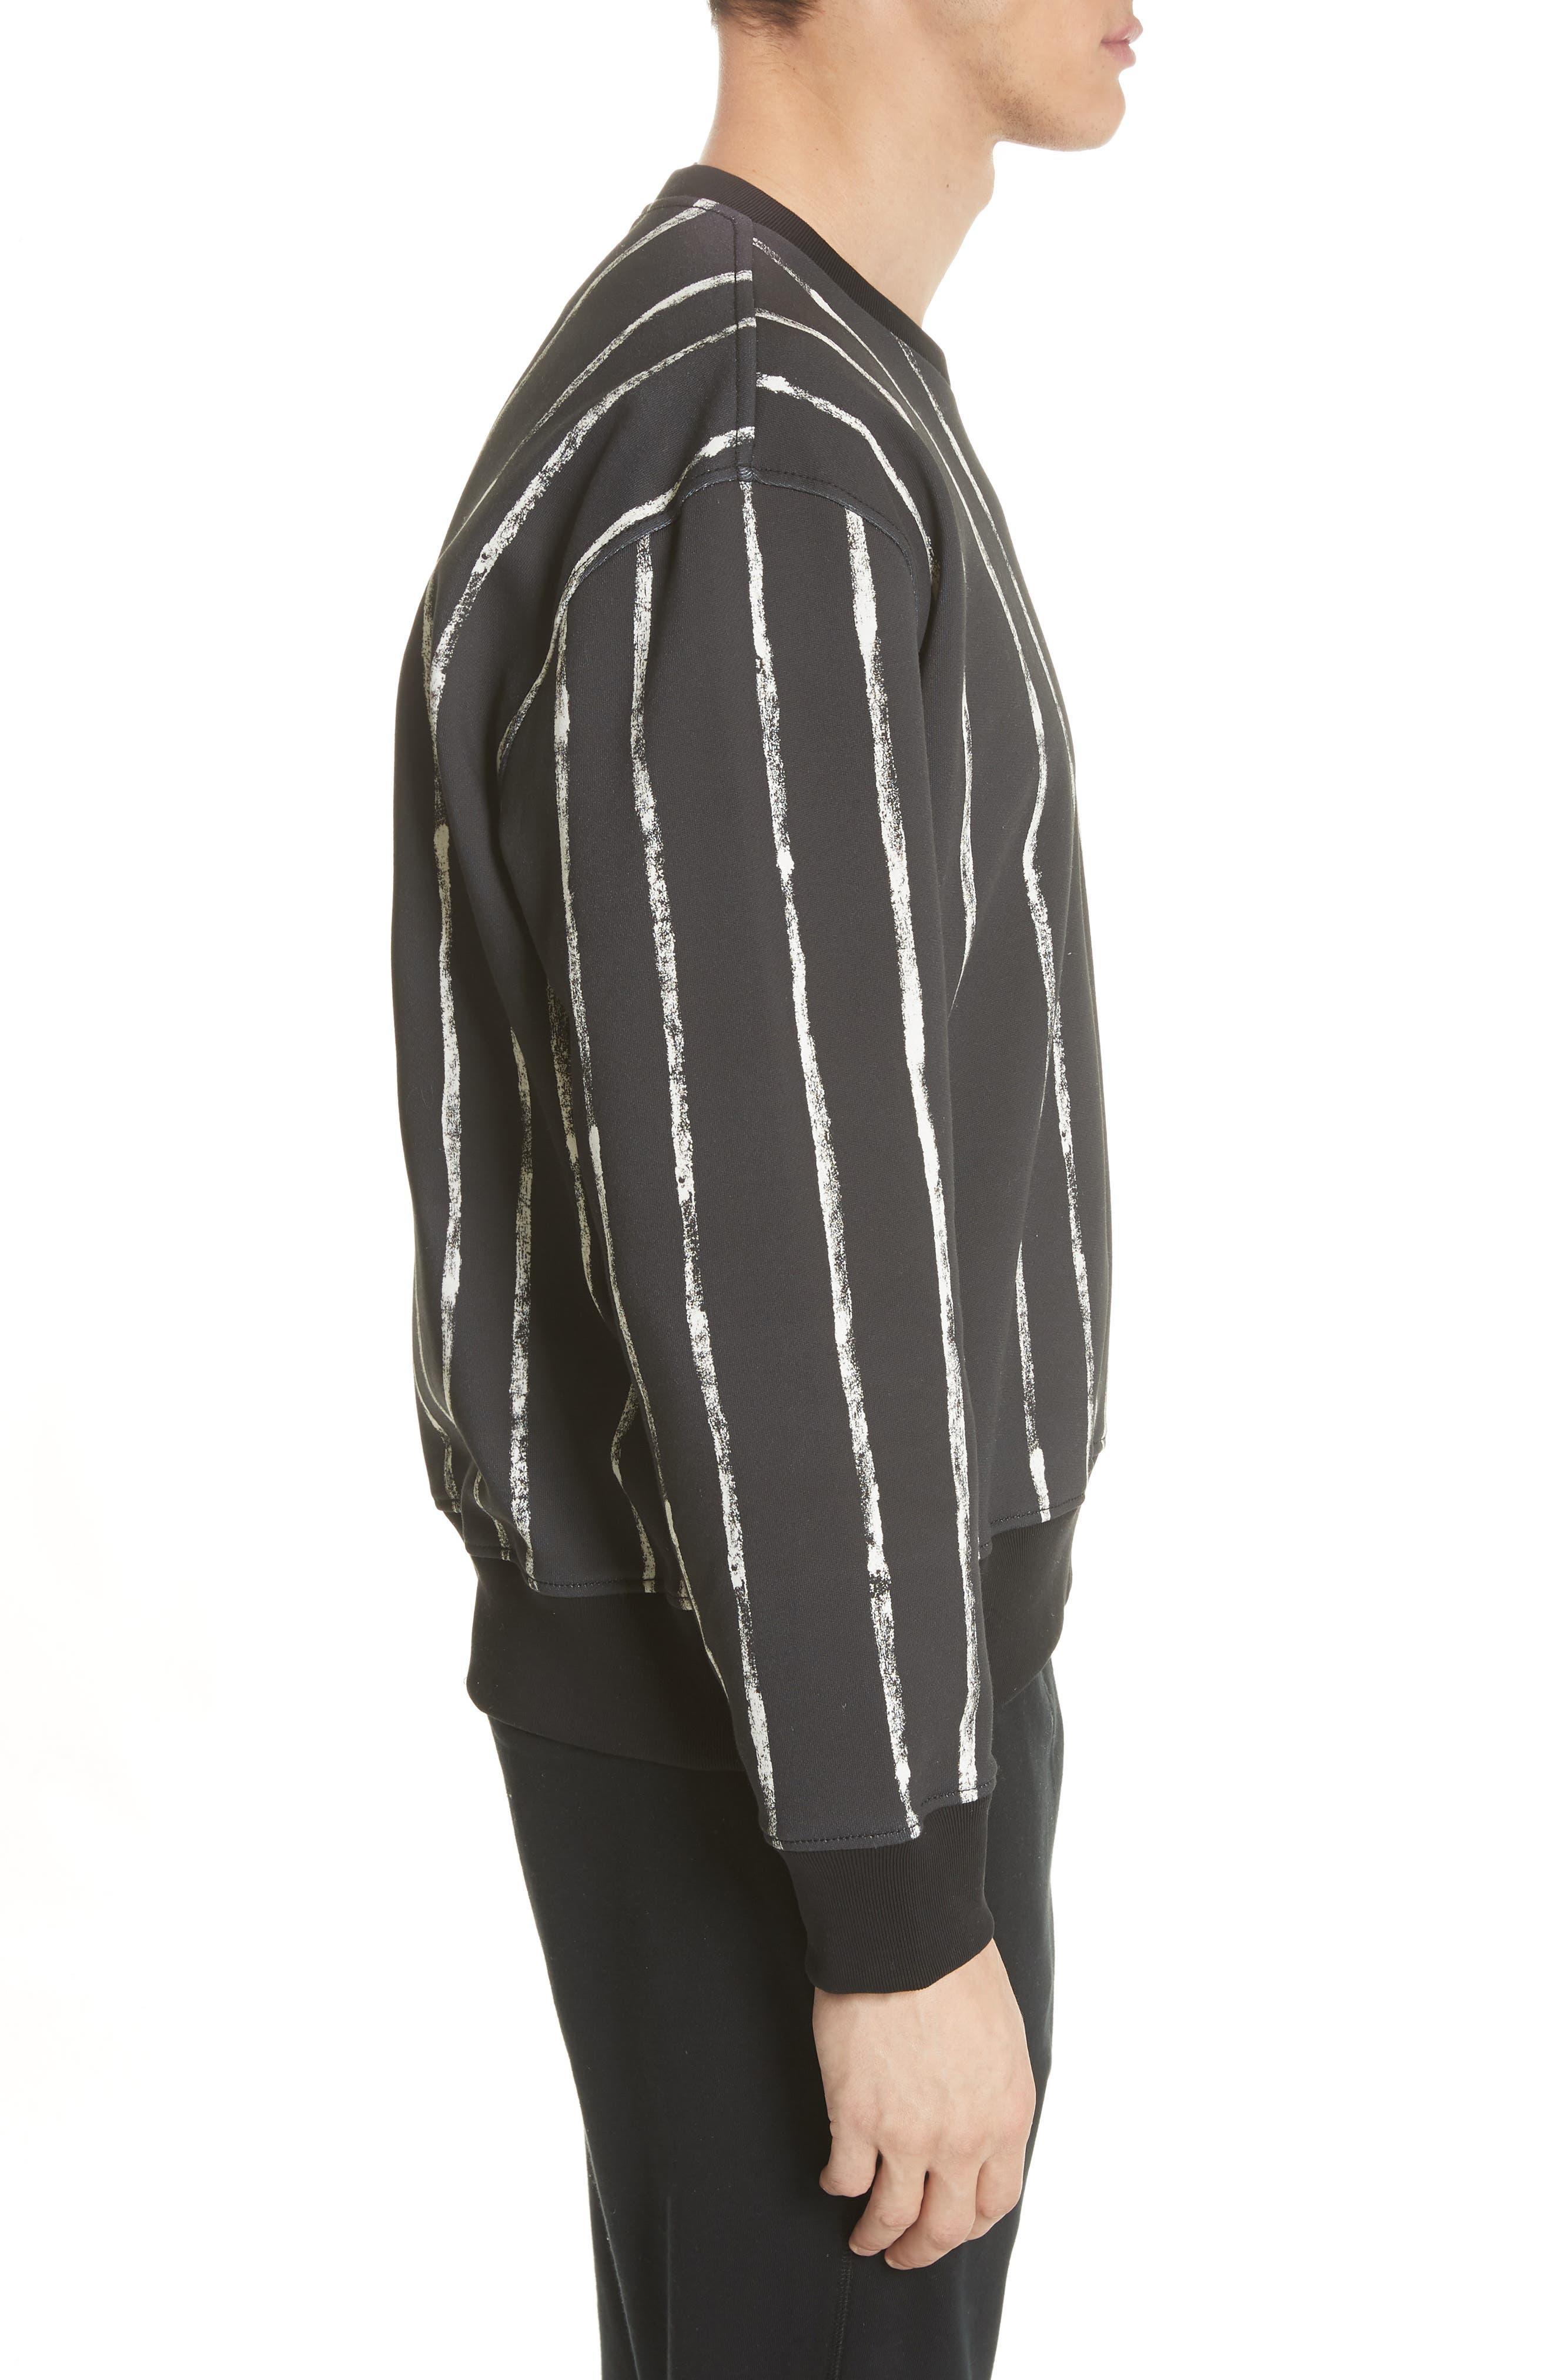 Paint Stripe Crewneck Sweatshirt,                             Alternate thumbnail 3, color,                             Black/ White